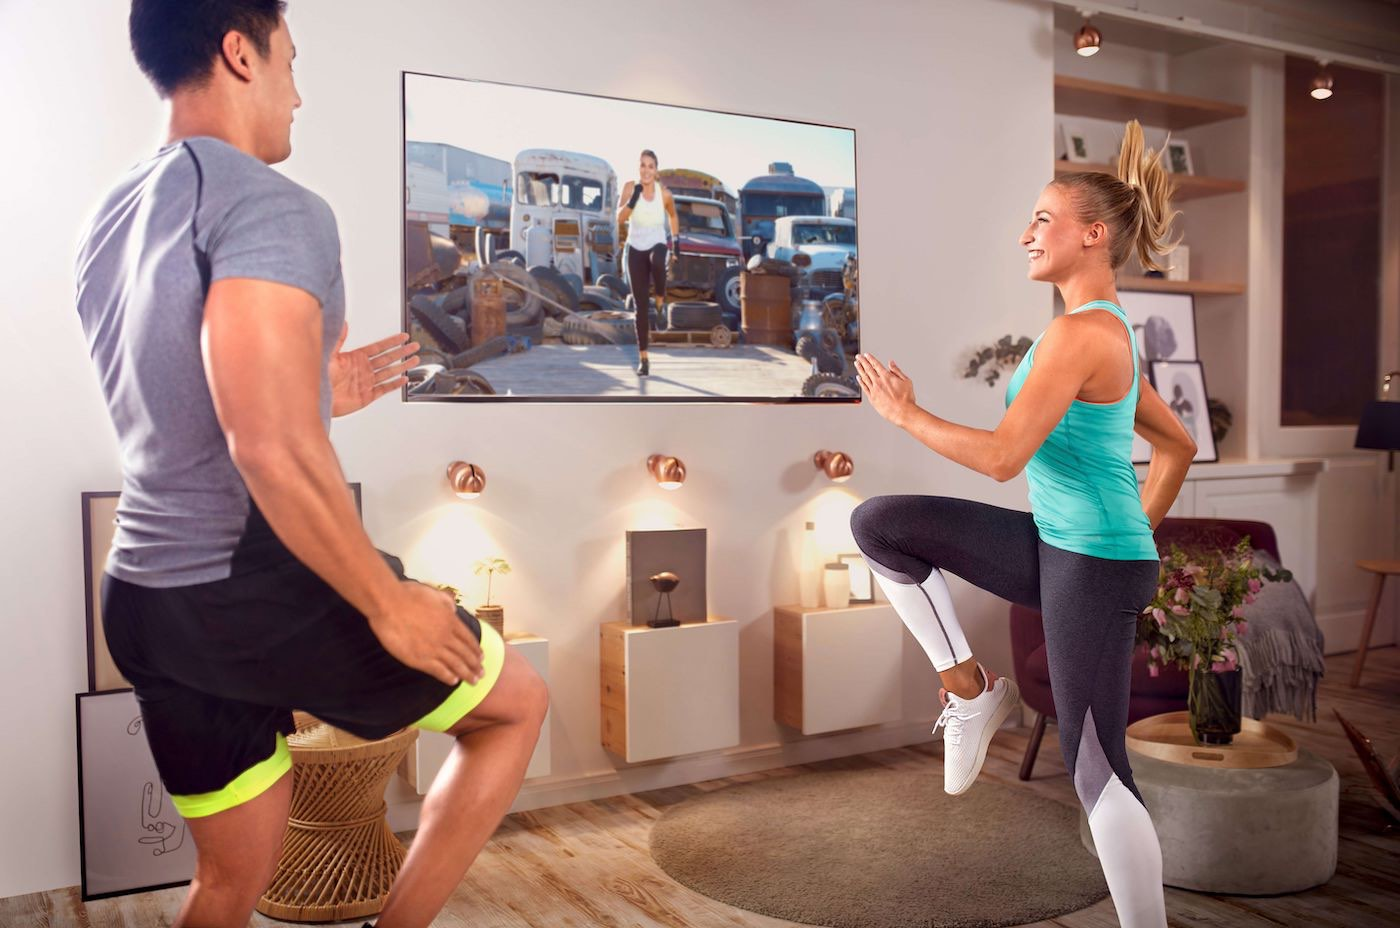 La plataforma virtual de fitness CYBEROBICS ahora de forma gratuita